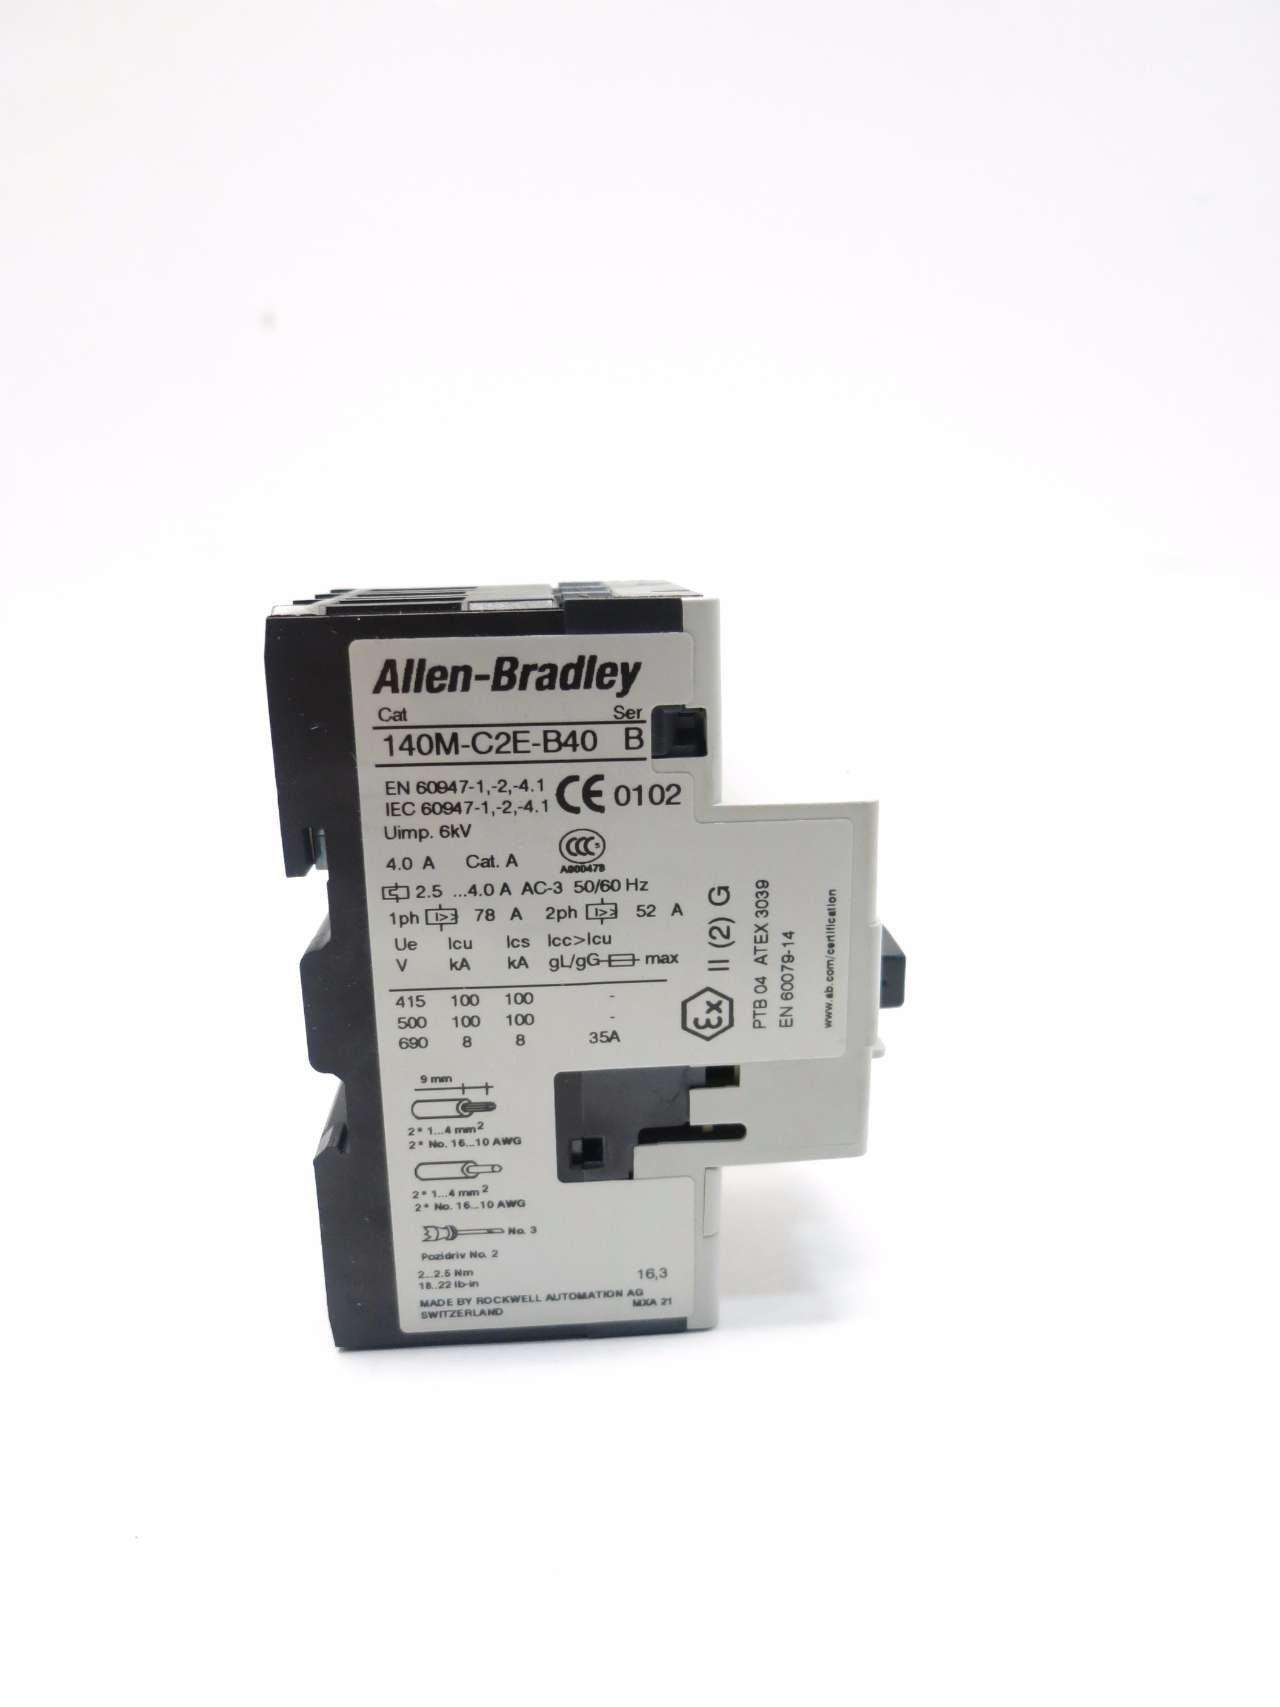 NEW ALLEN BRADLEY 140M-C2E-B40 SER B 3HP 2.5-4A AMP MANUAL MOTOR STARTER D512285 by Allen-Bradley (Image #3)